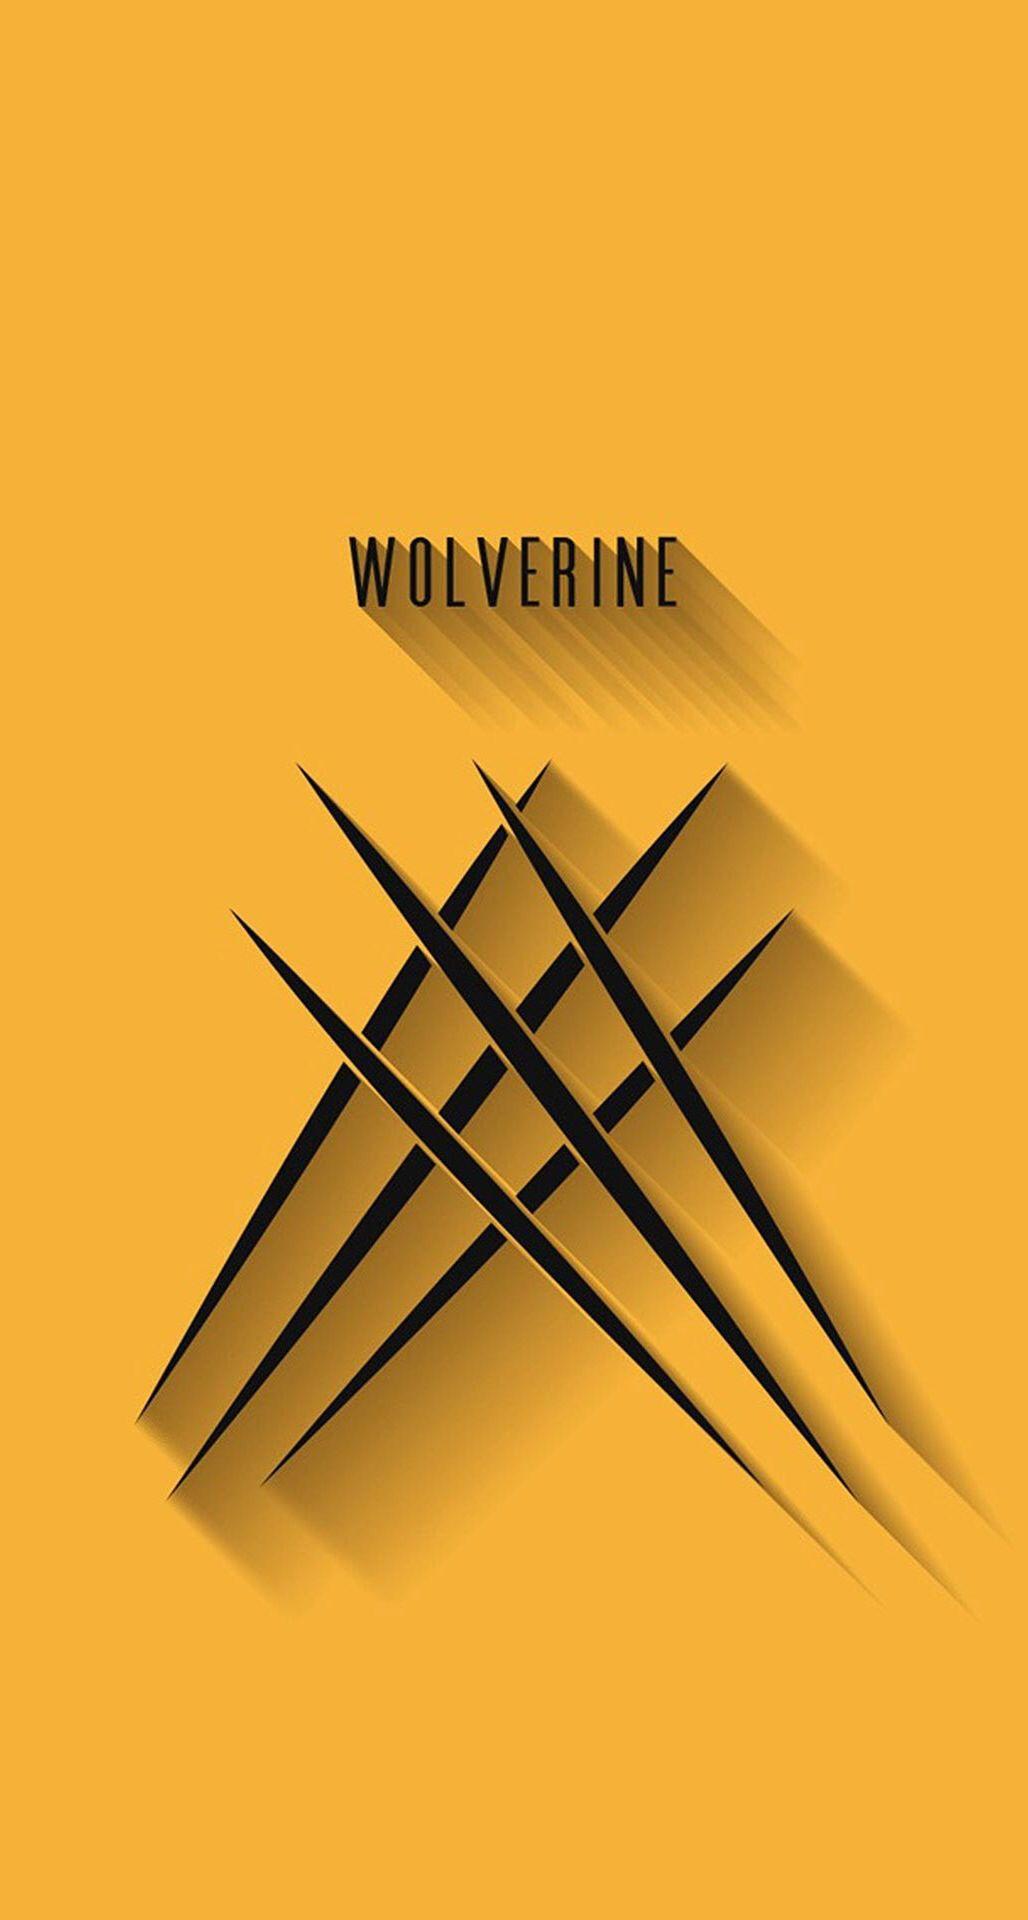 Wallpaper iphone 6 xman - X Men Minimalist Poster